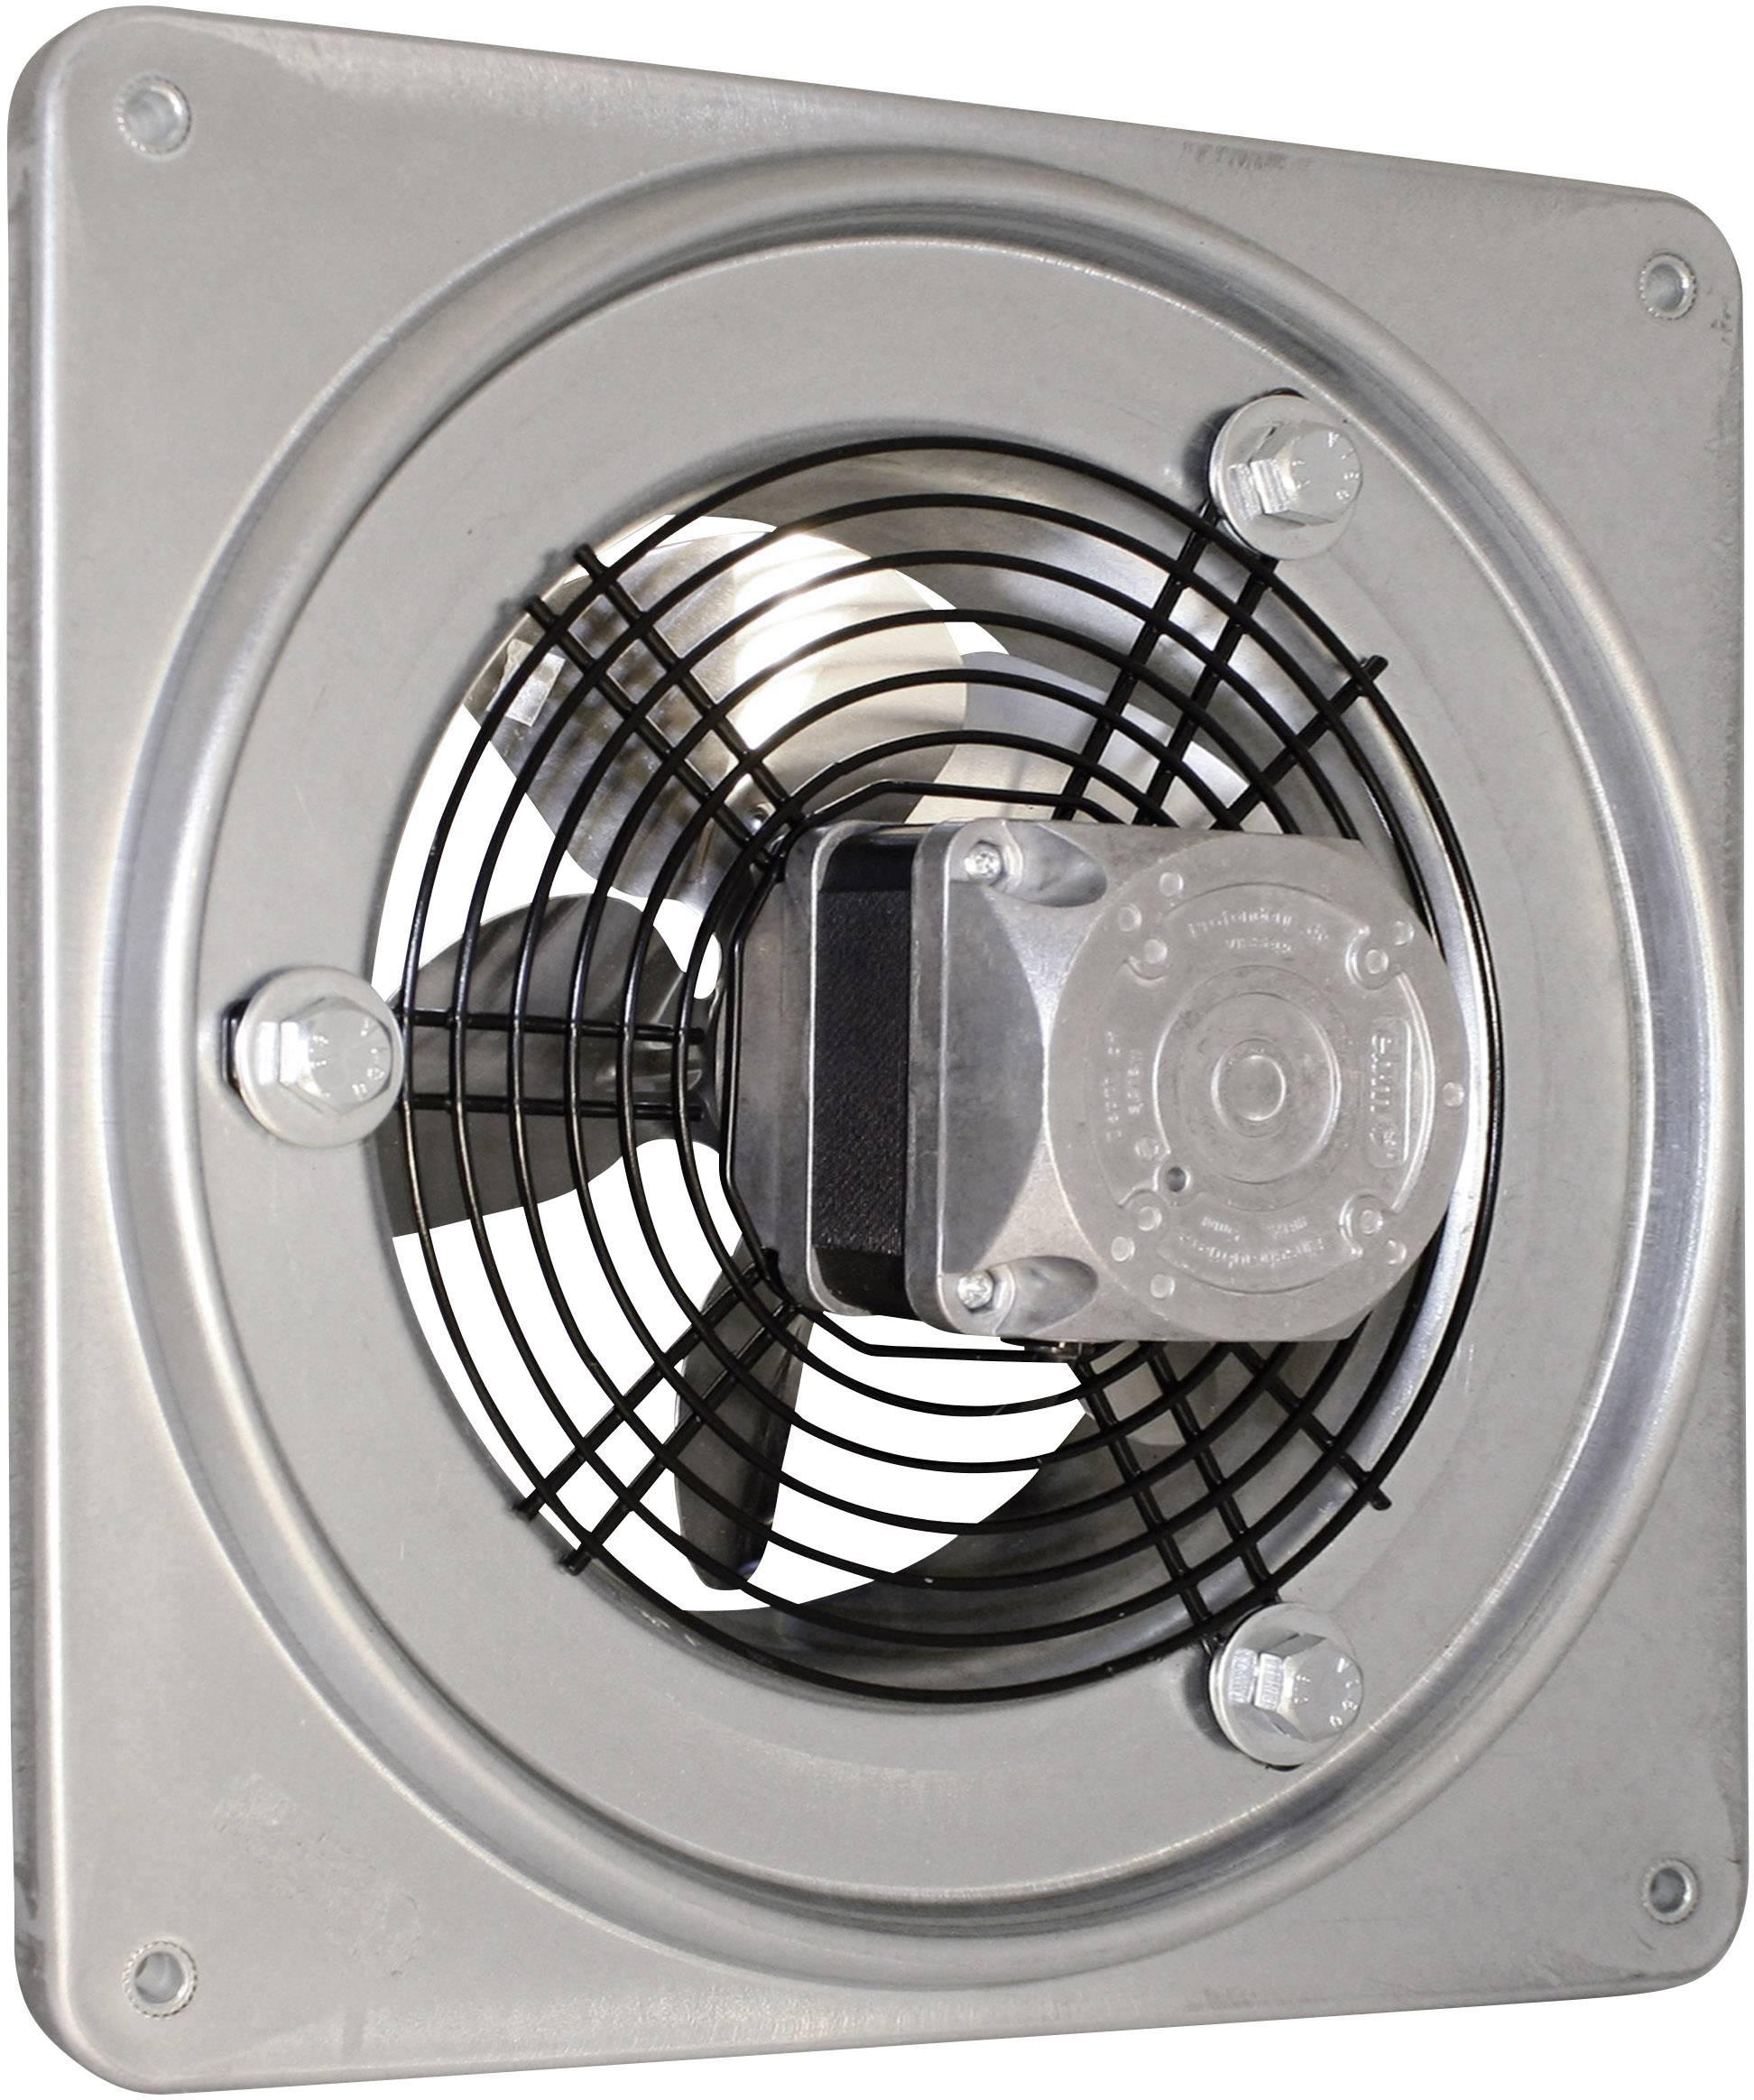 Vestavný ventilátor Basic 30, 40064, 230 V, 1200 m3/h, 39 cm